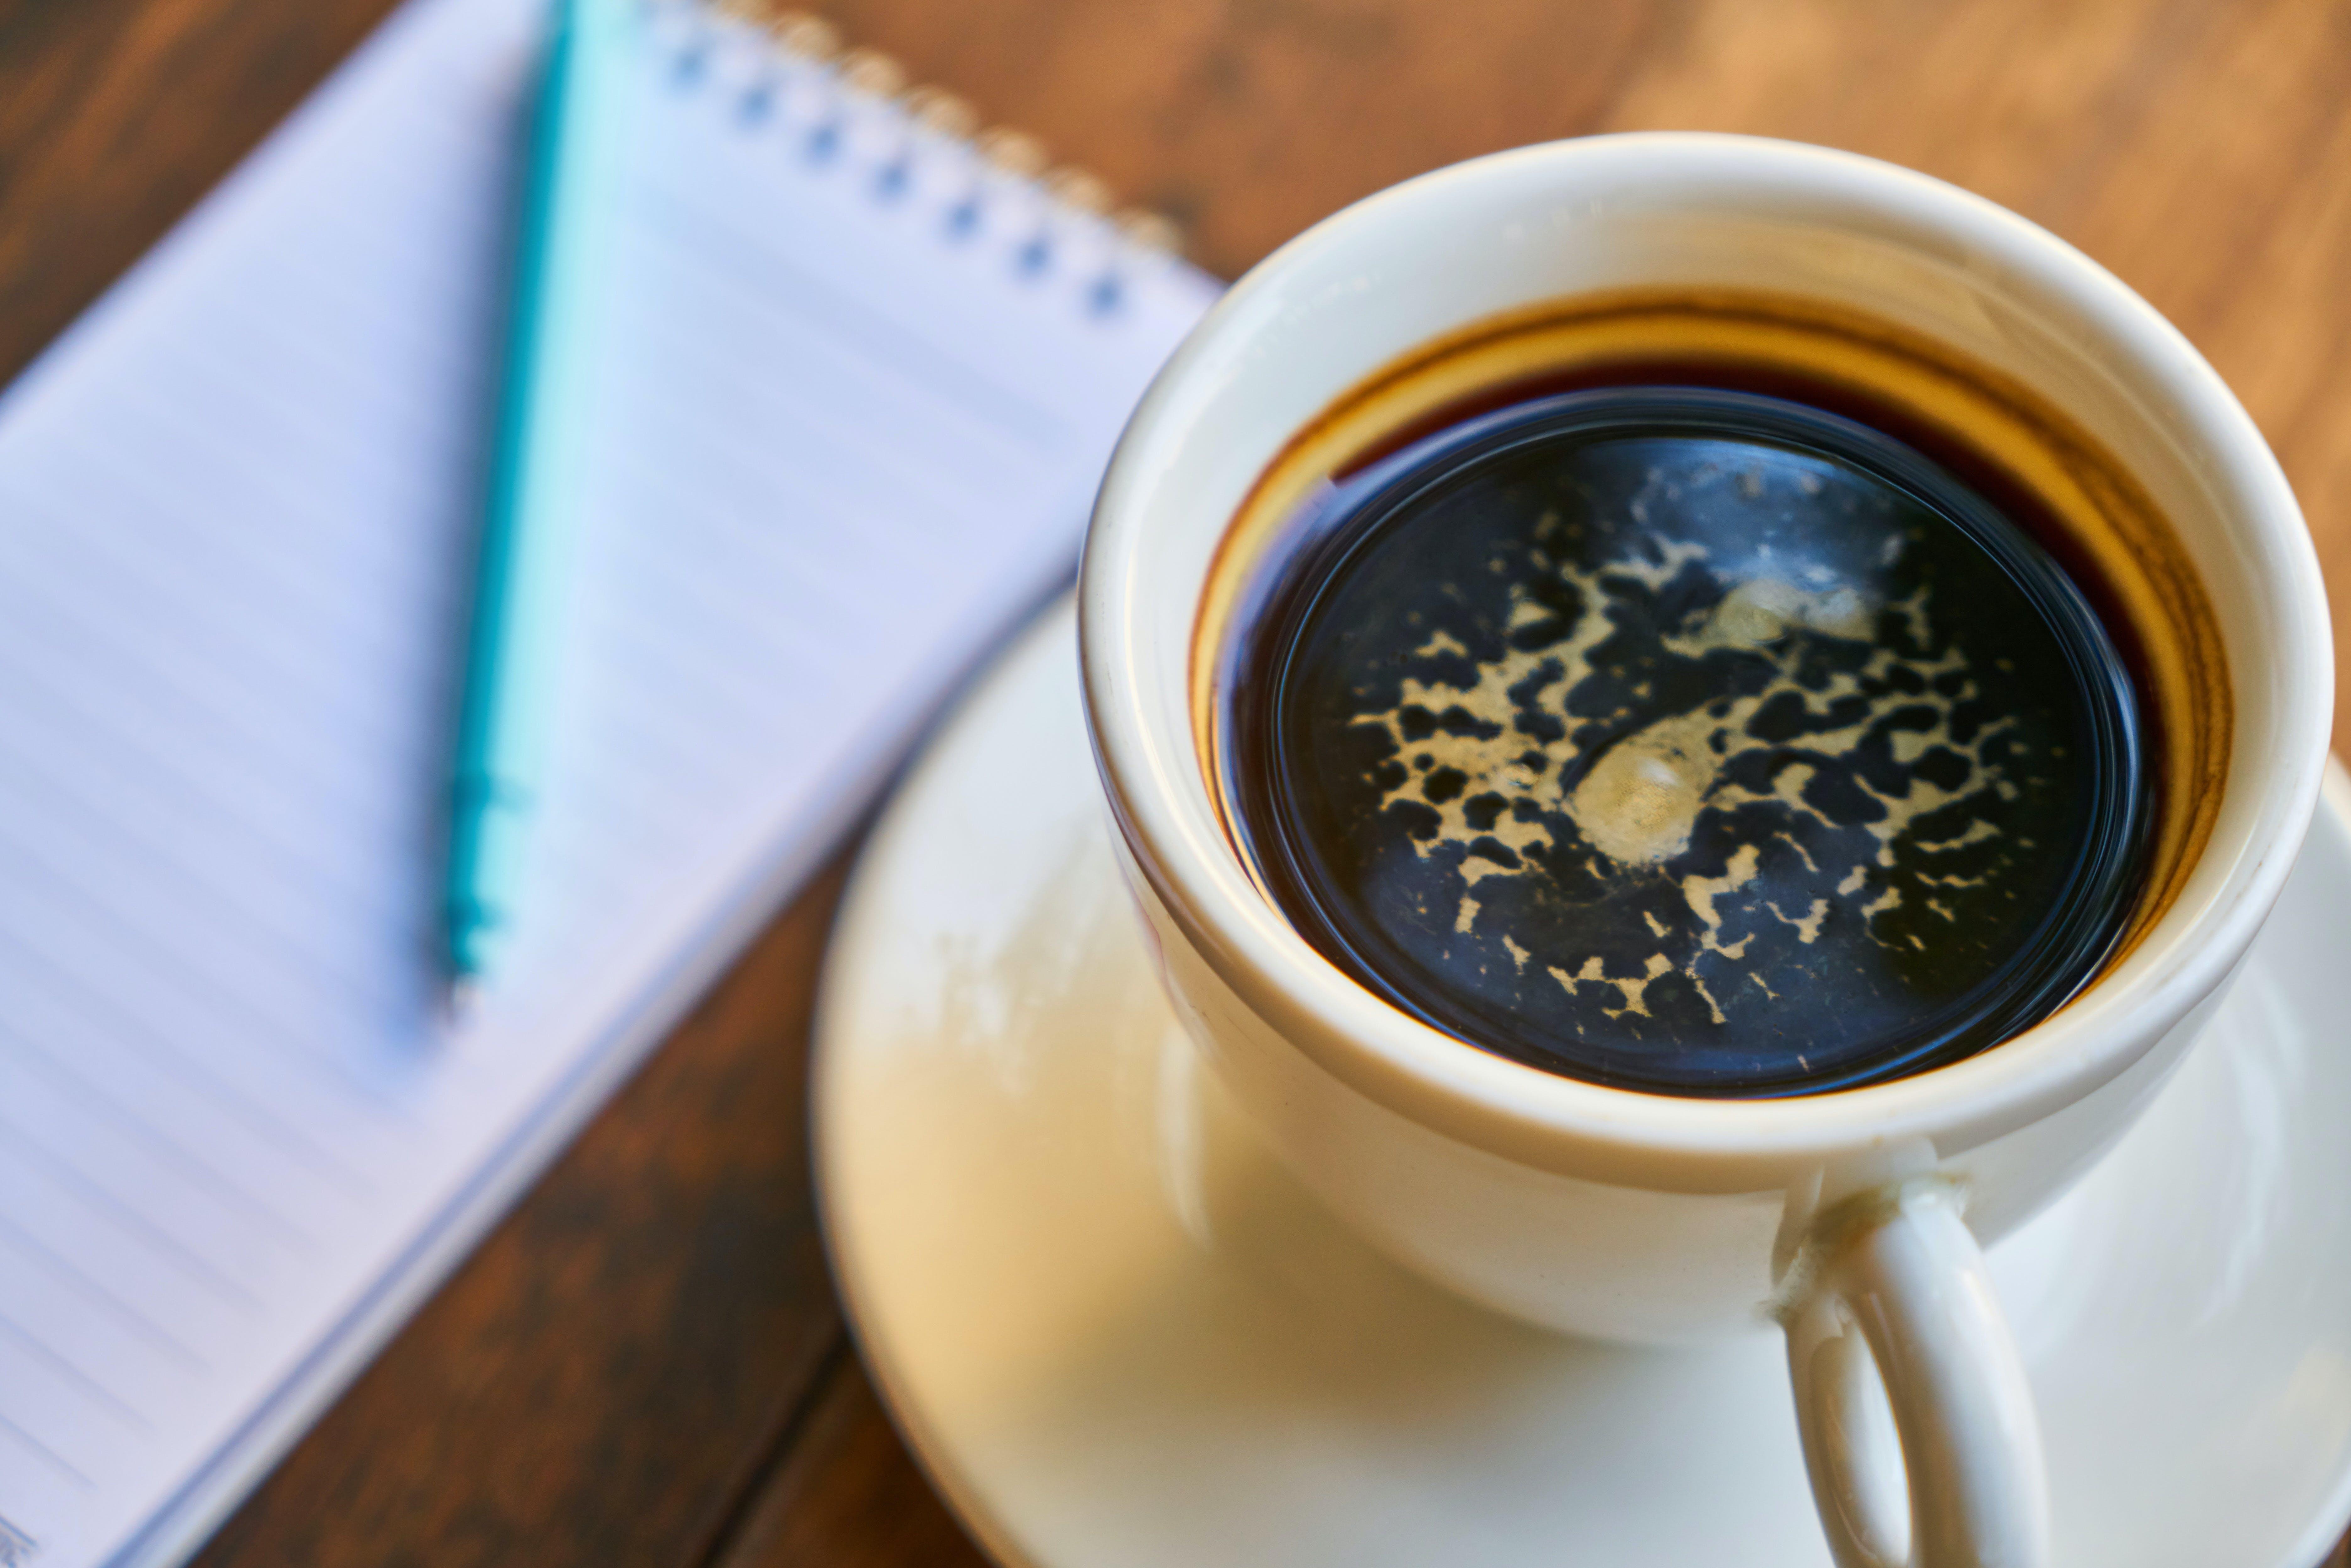 de aroma, bloc de notas, bolígrafo, café